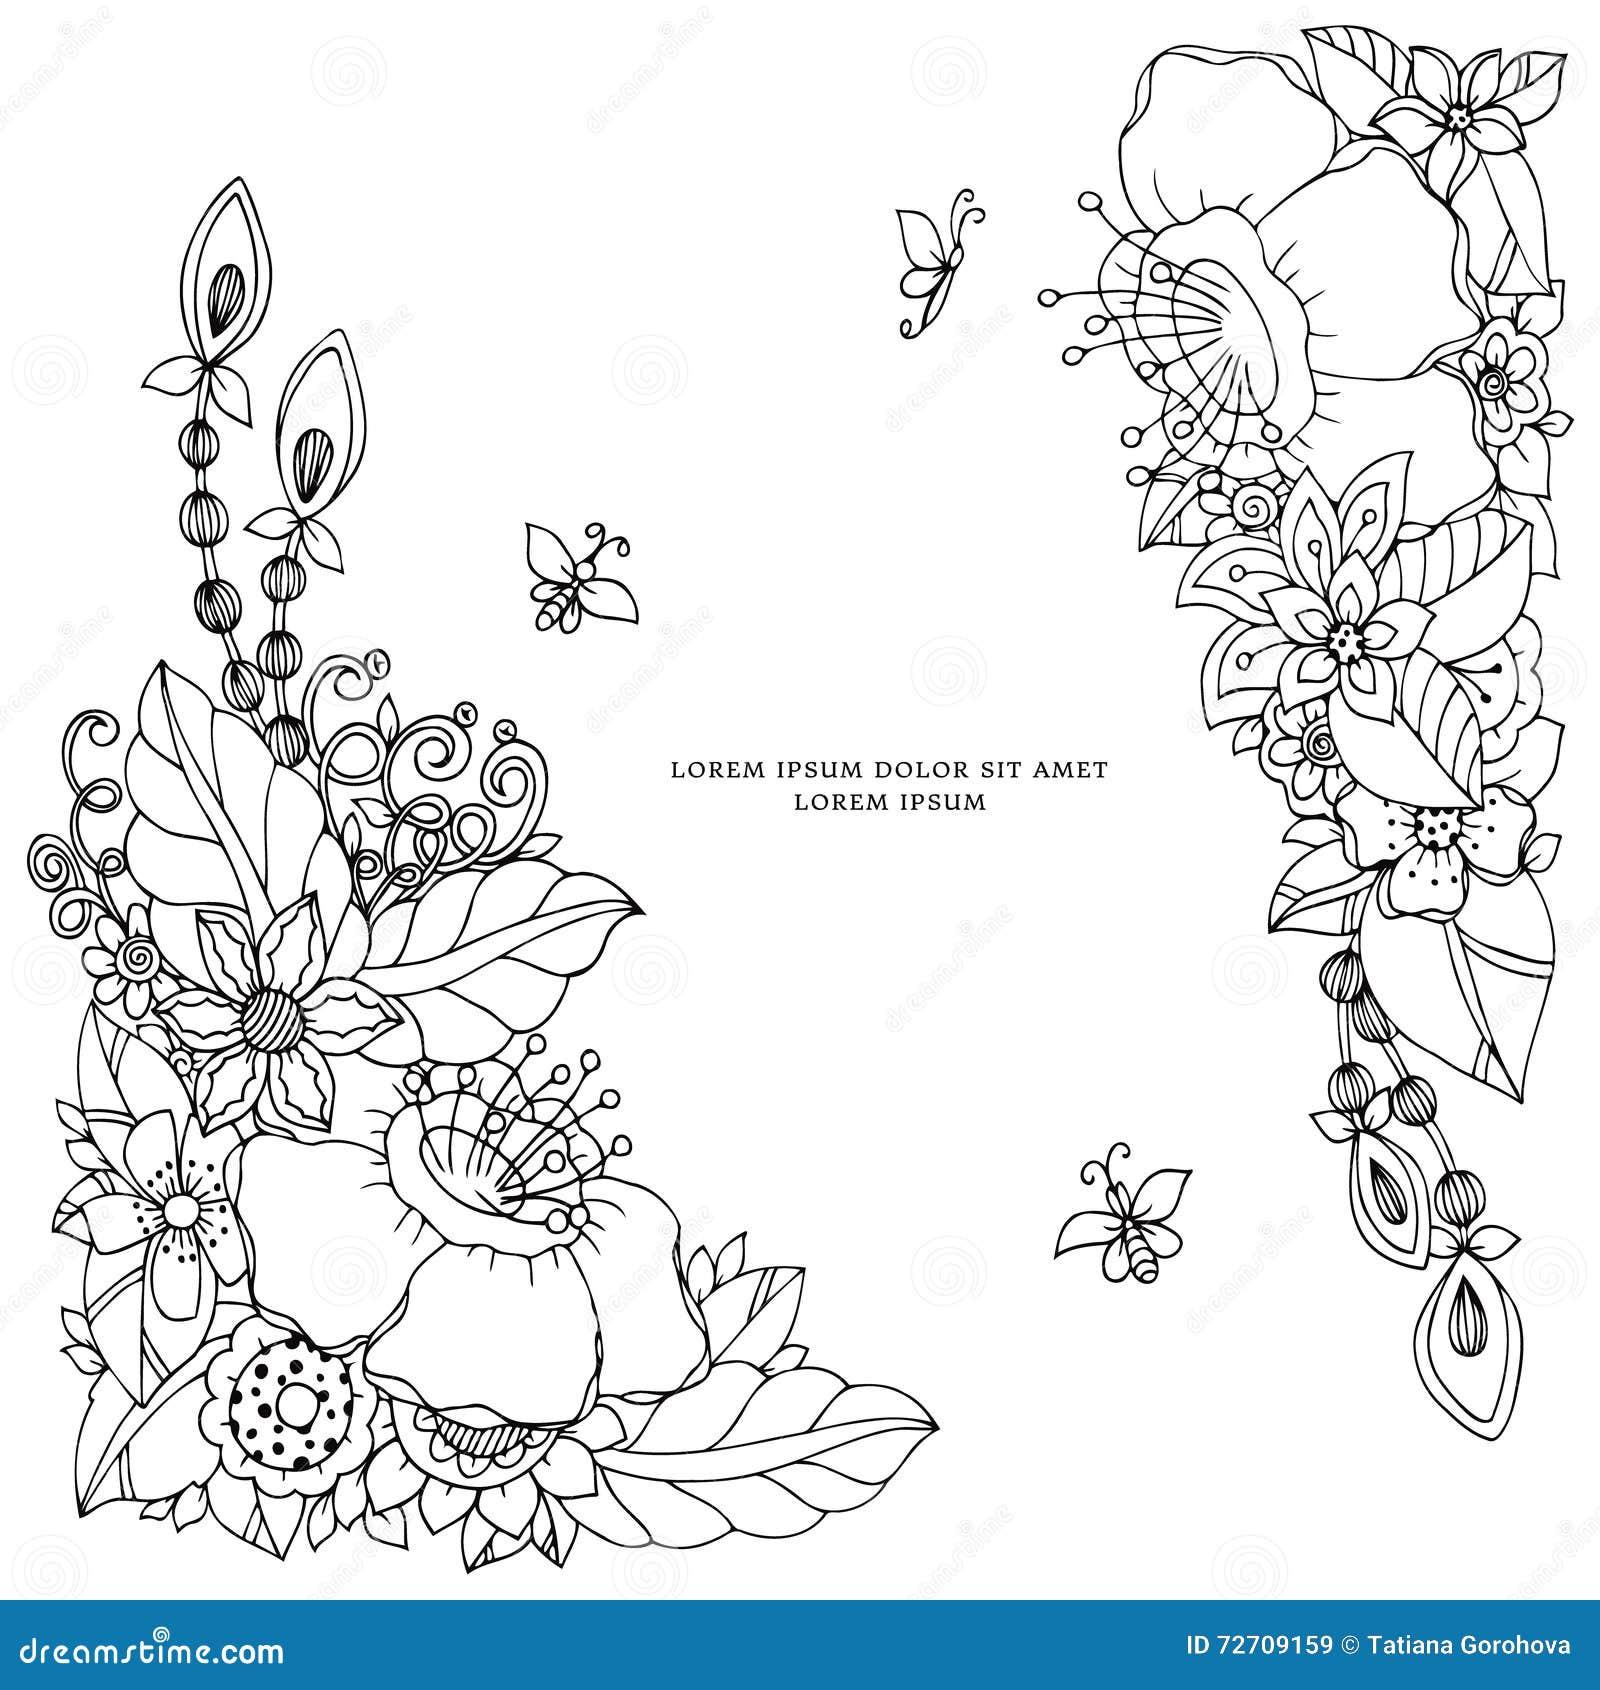 Zen colouring in book - Free Zen Coloring Book Vector Illustration Of Floral Frame Zen Tangle Dudlart Coloring Book Anti